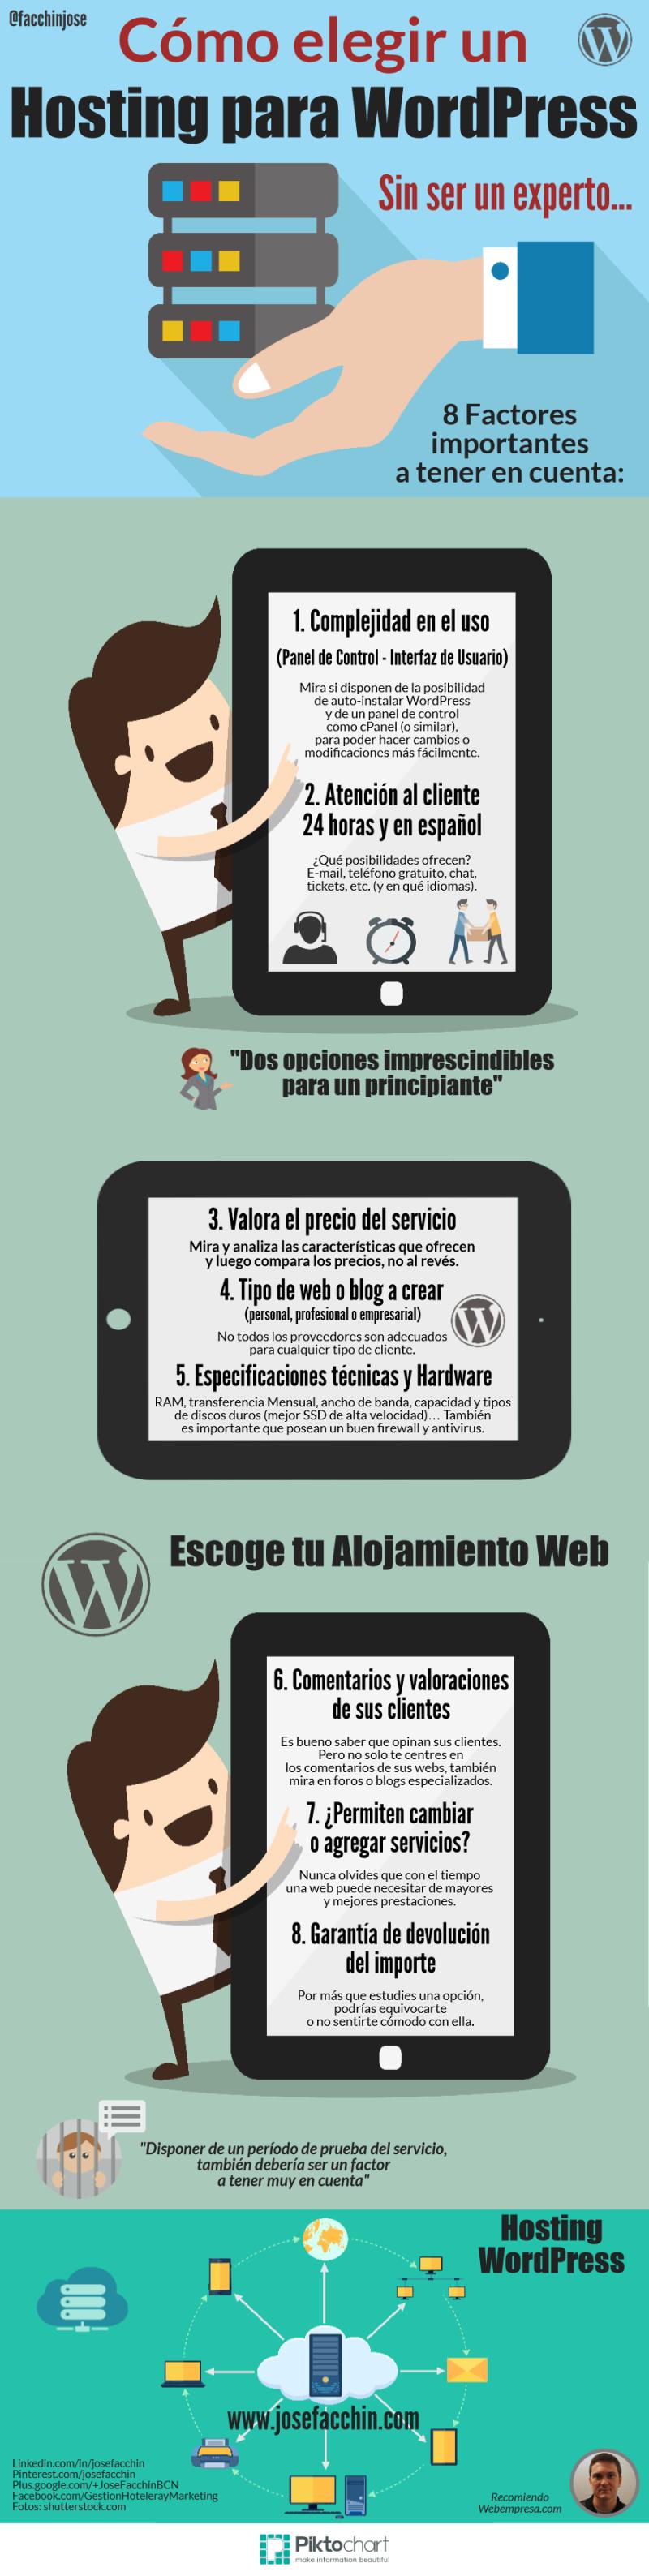 Cómo elegir hosting para WordPress (sin ser experto)